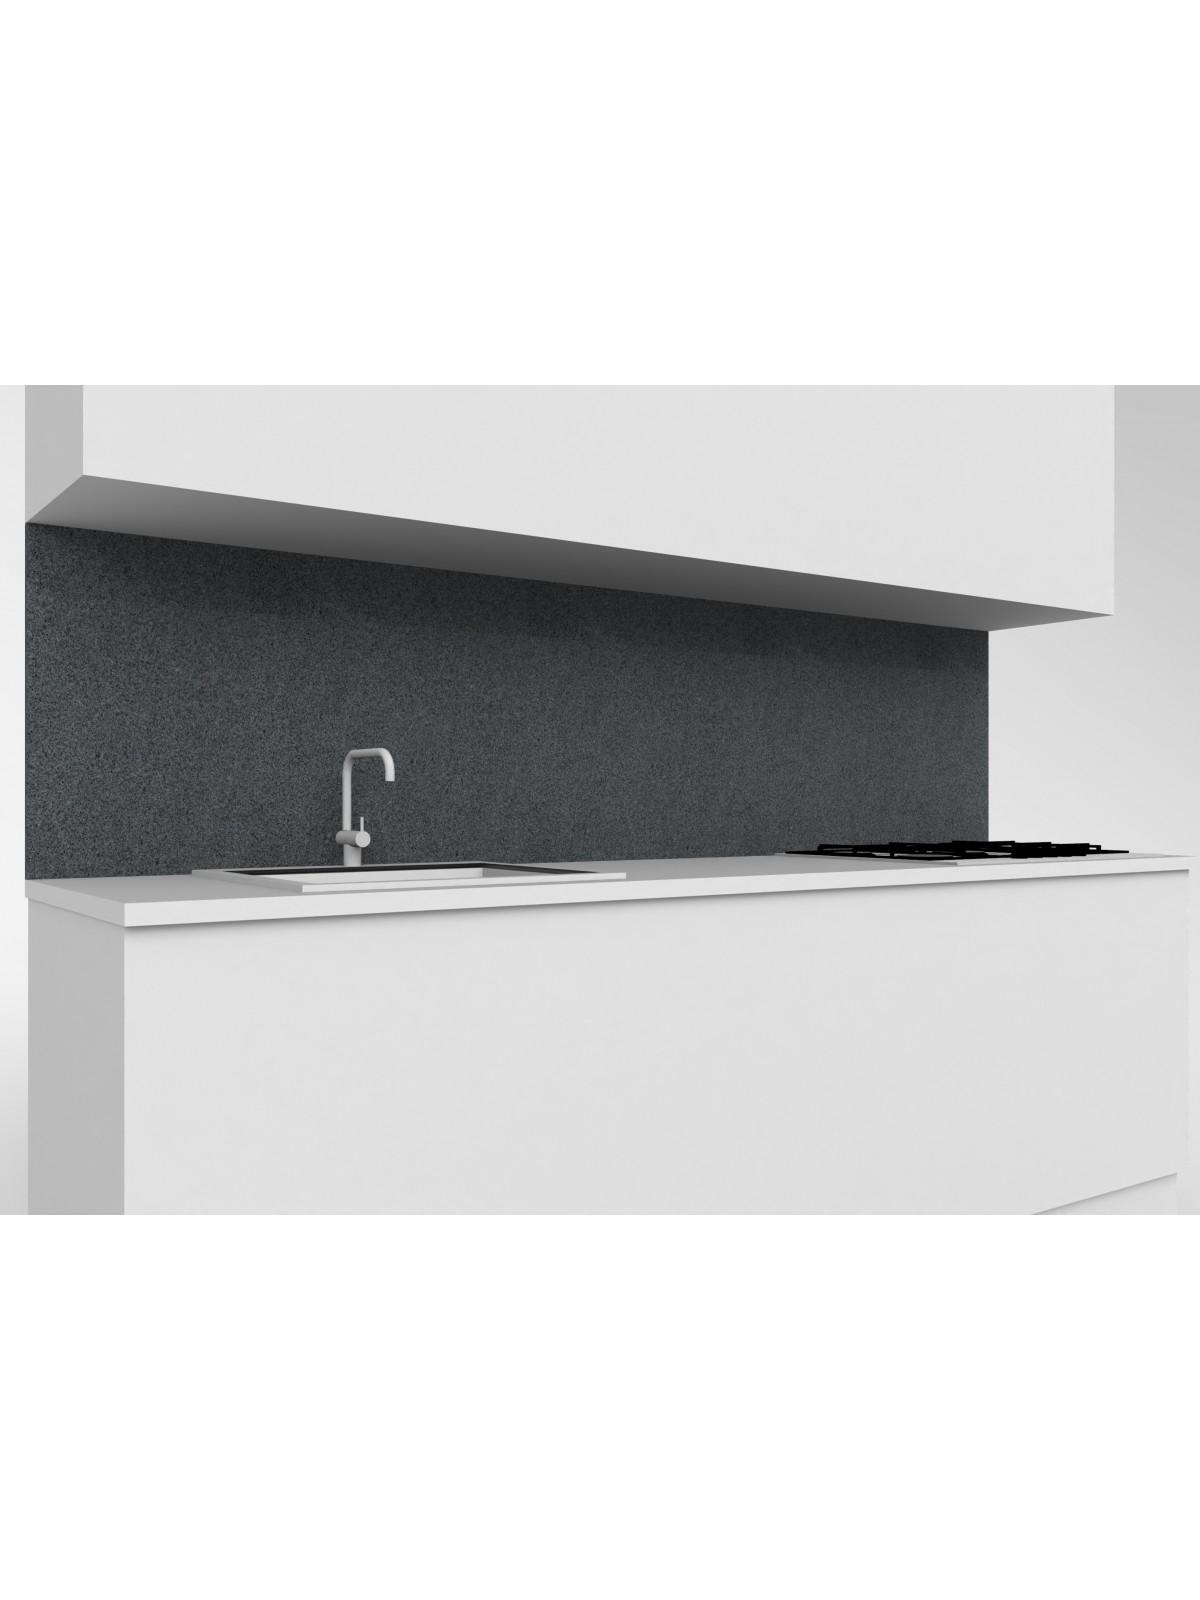 Erhöhte obere mobile Küche in Diorit Granit Dunkel